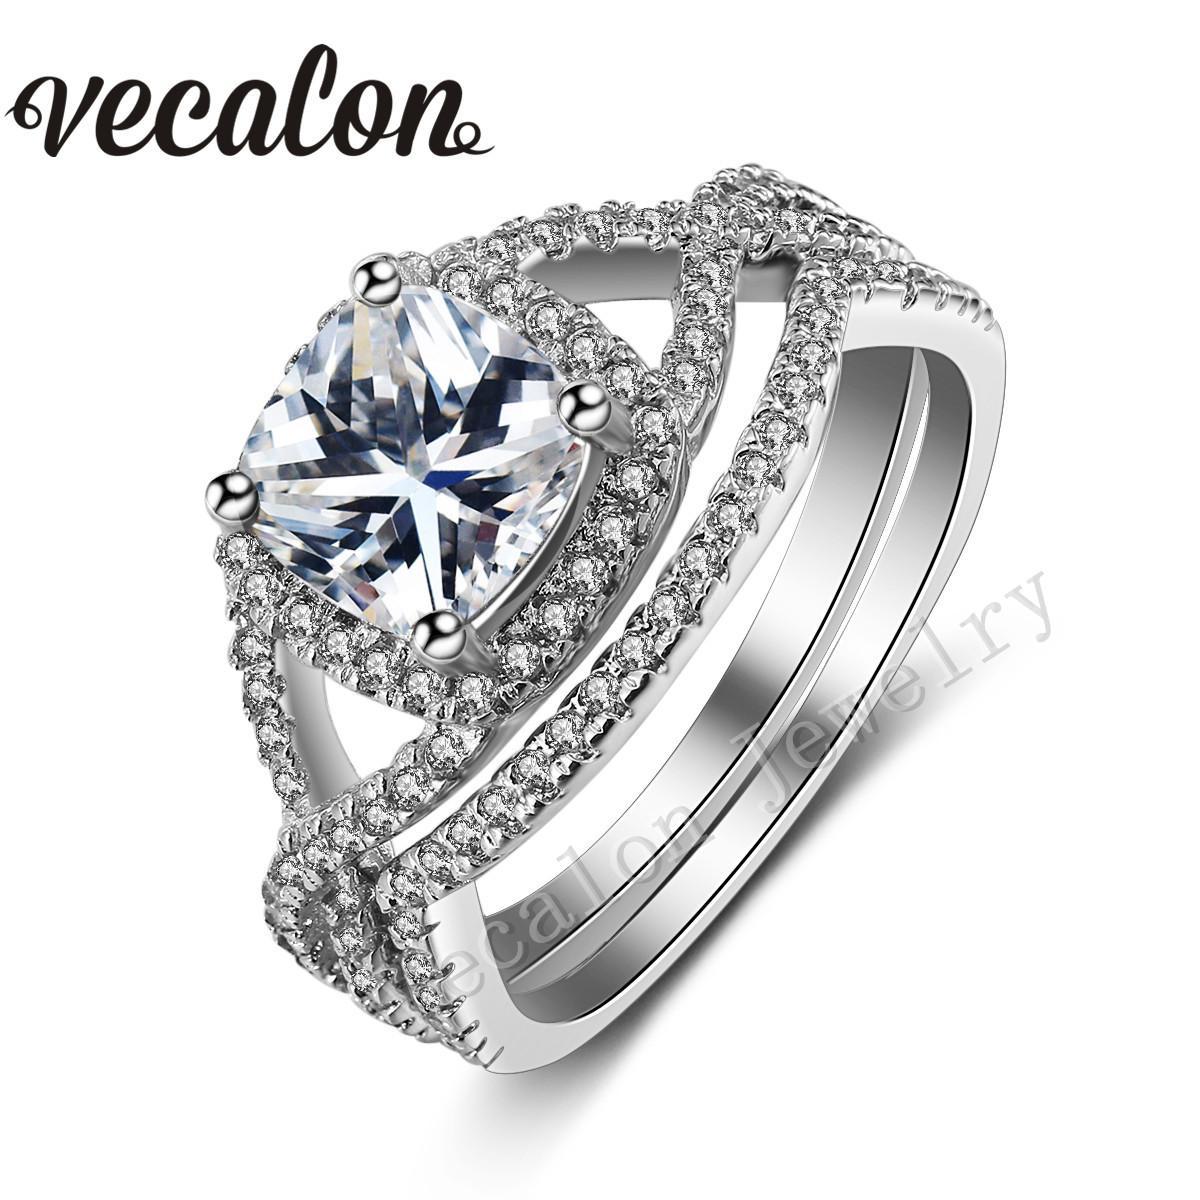 2017 Vecalon 2016 New Design Cushion Cut 3ct Simulated Diamond Cz Wedding Ring Set For Women